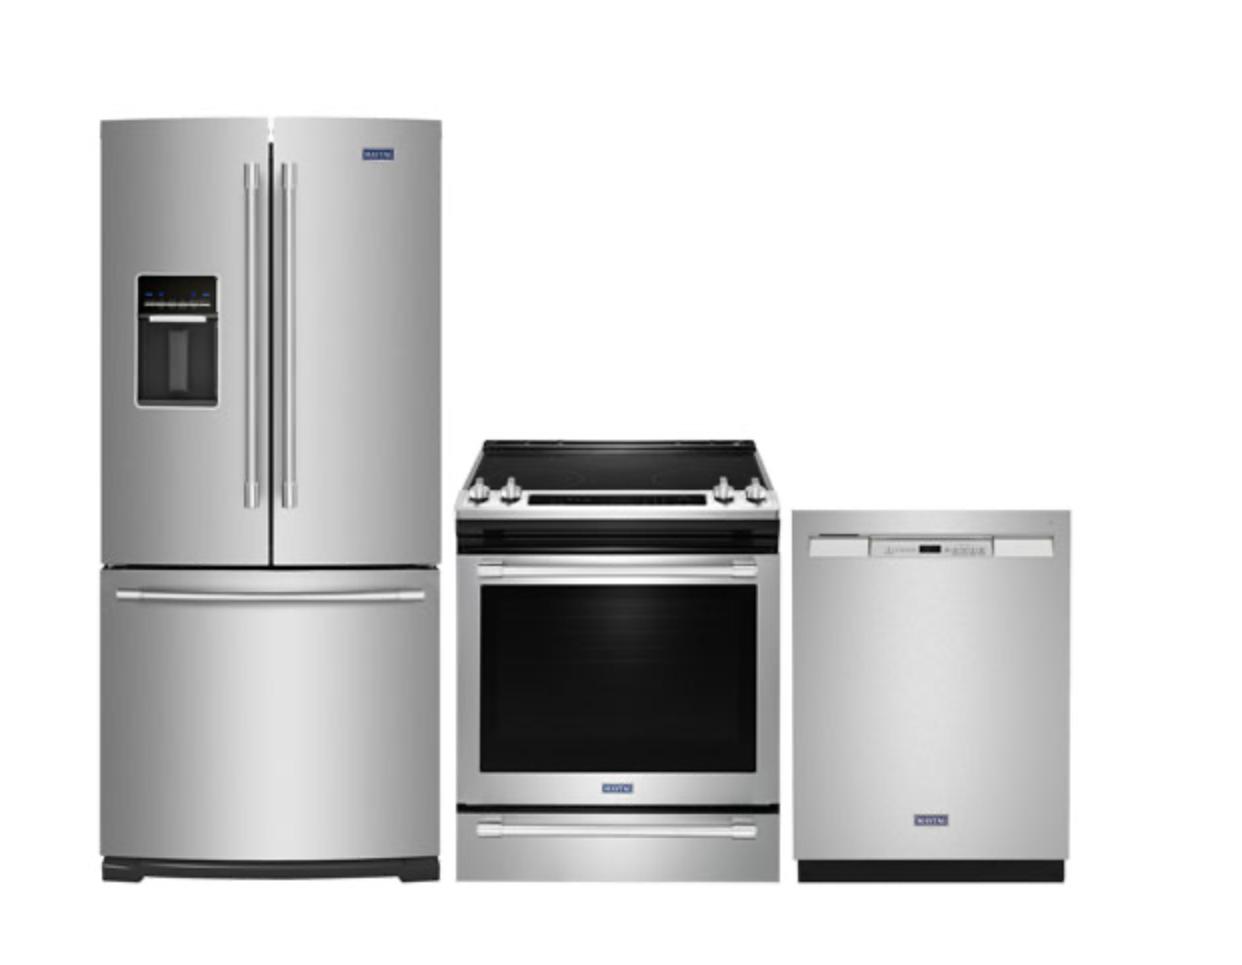 Maytag kitchen appliances package